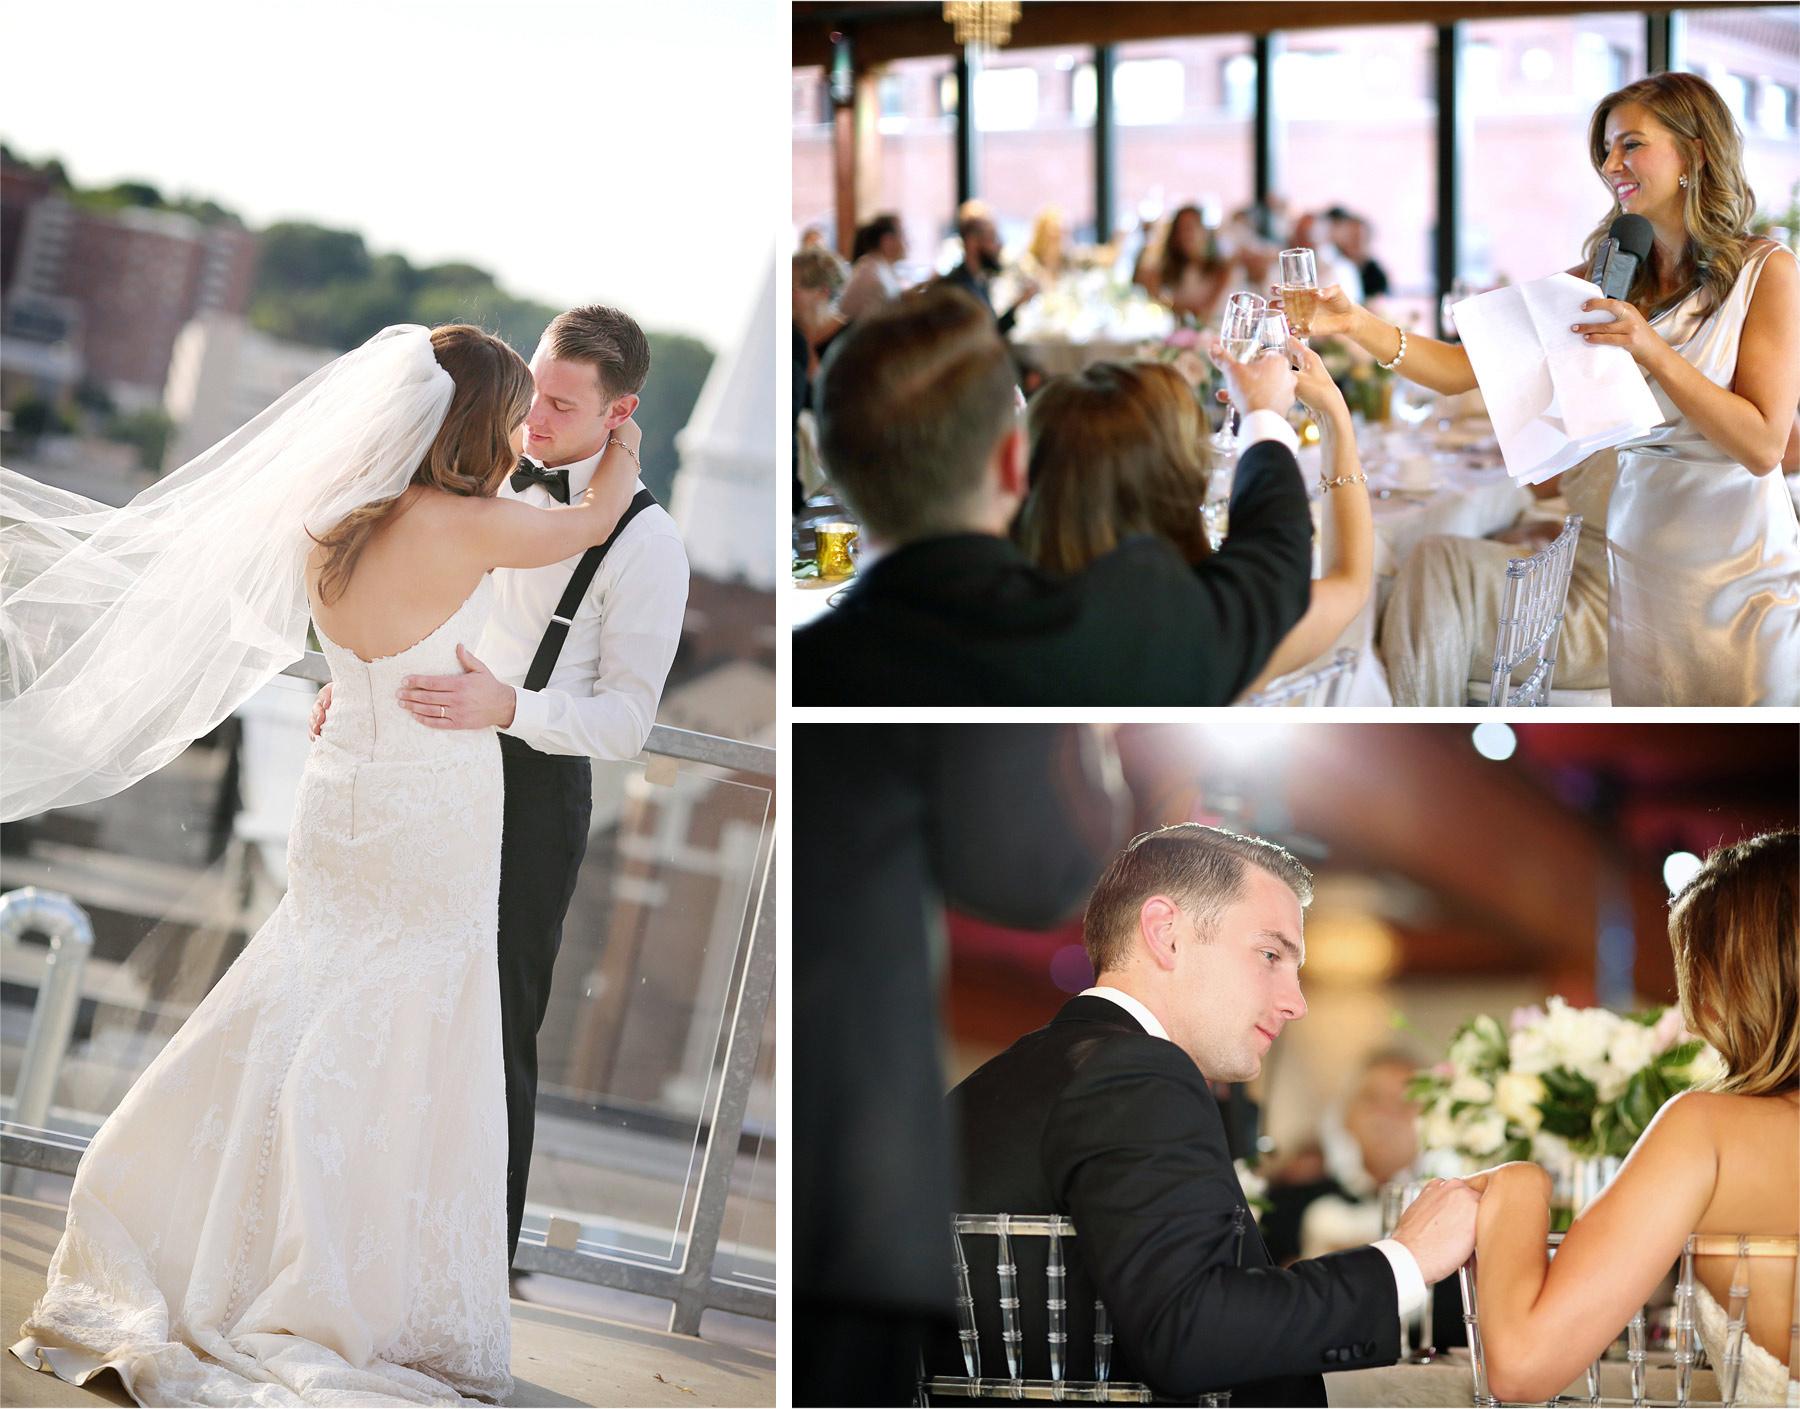 24-Saint-Paul-Minnesota-Wedding-Photographer-by-Andrew-Vick-Photography-Summer-Abulae-Bride-Groom-Suspenders-Veil-Embrace-Bridesmaids-Speeches-Toasts-Molly-and-Dan.jpg